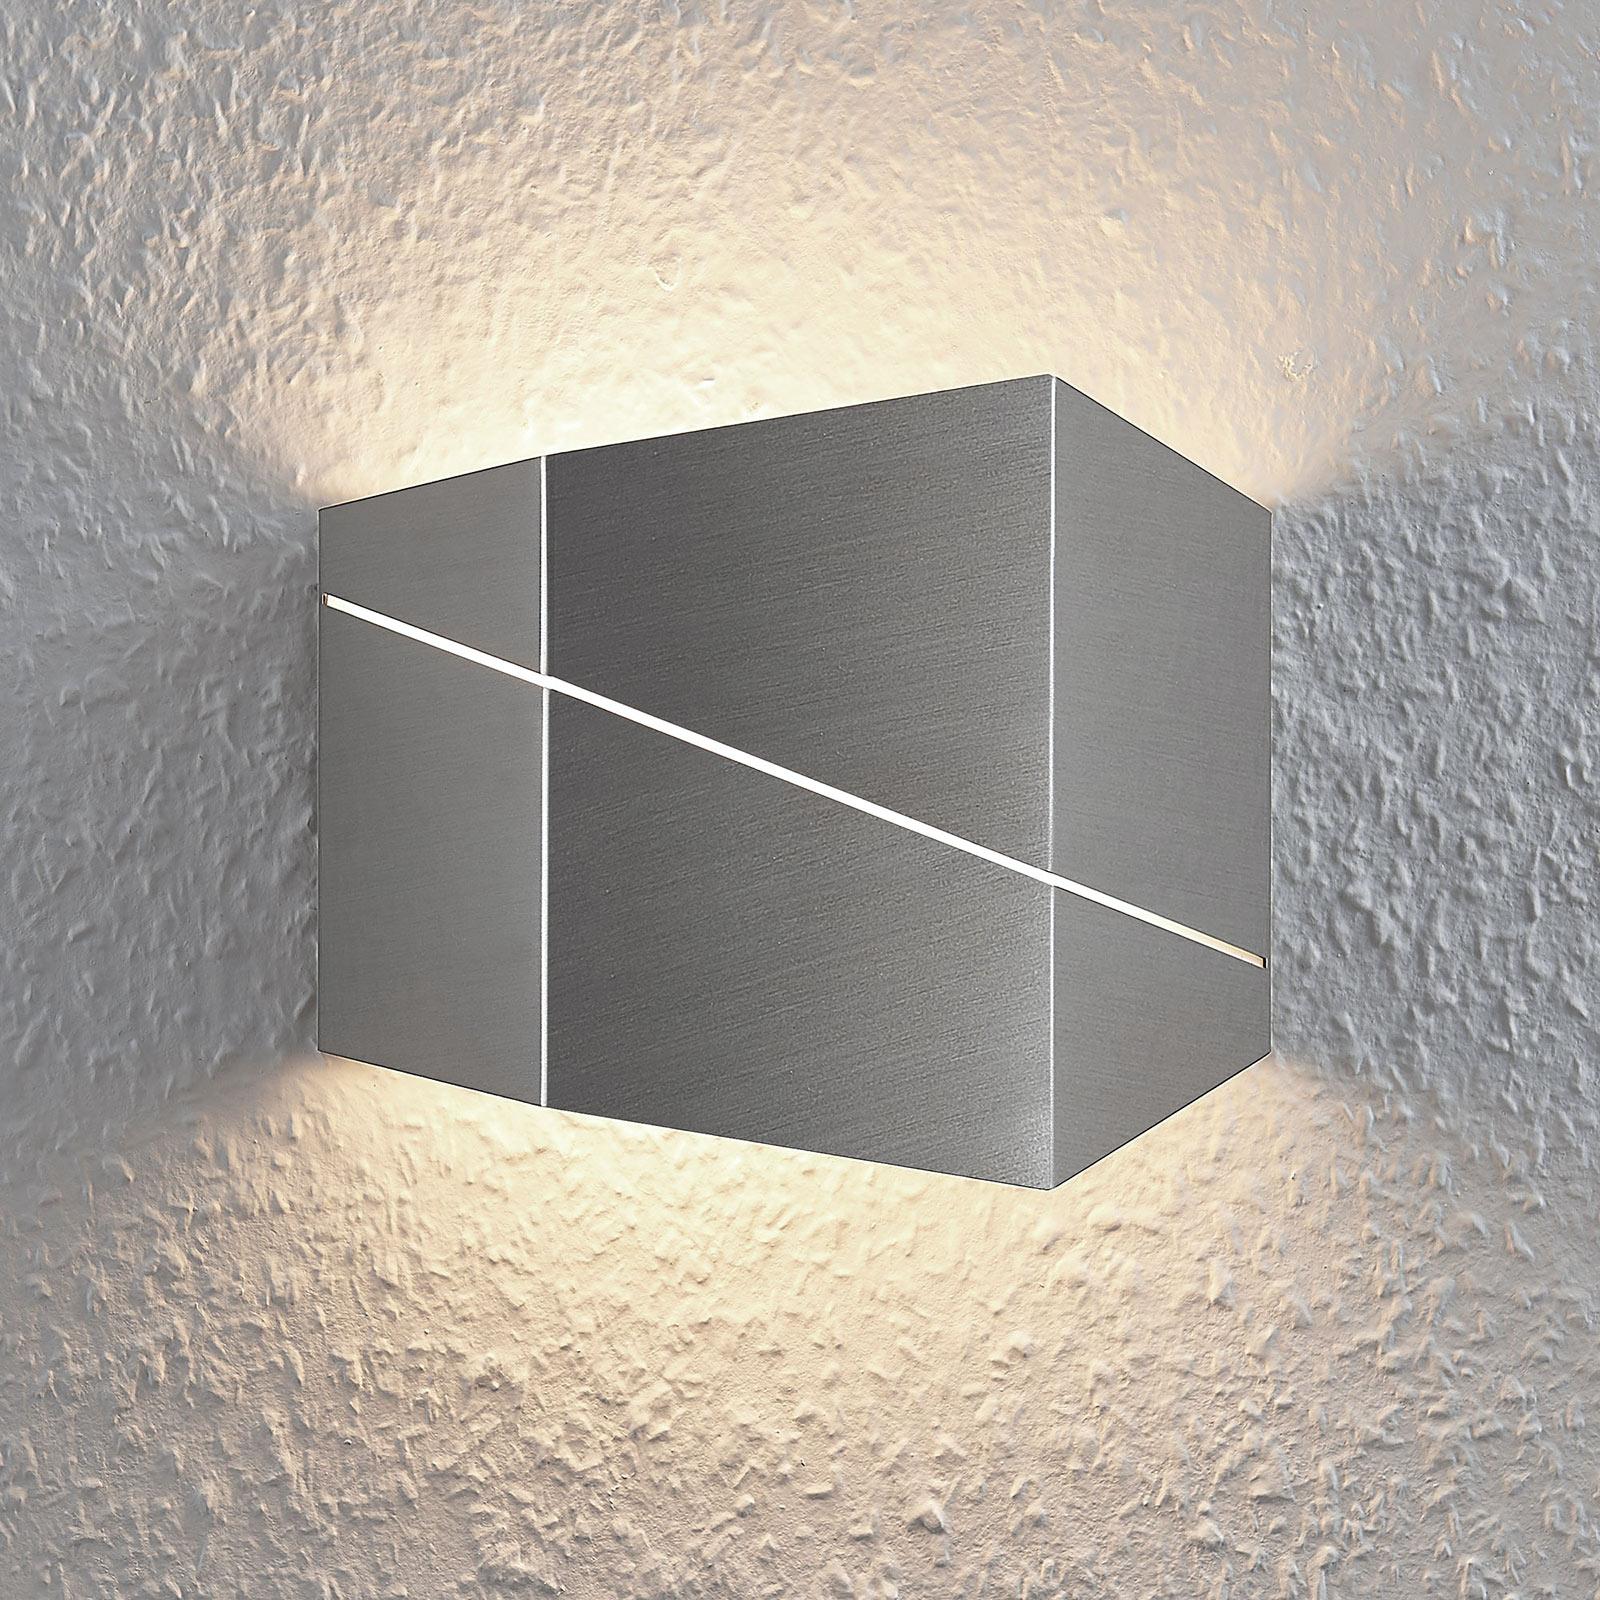 Nástěnné LED svítidlo Nikolae, 18cm, matný nikl